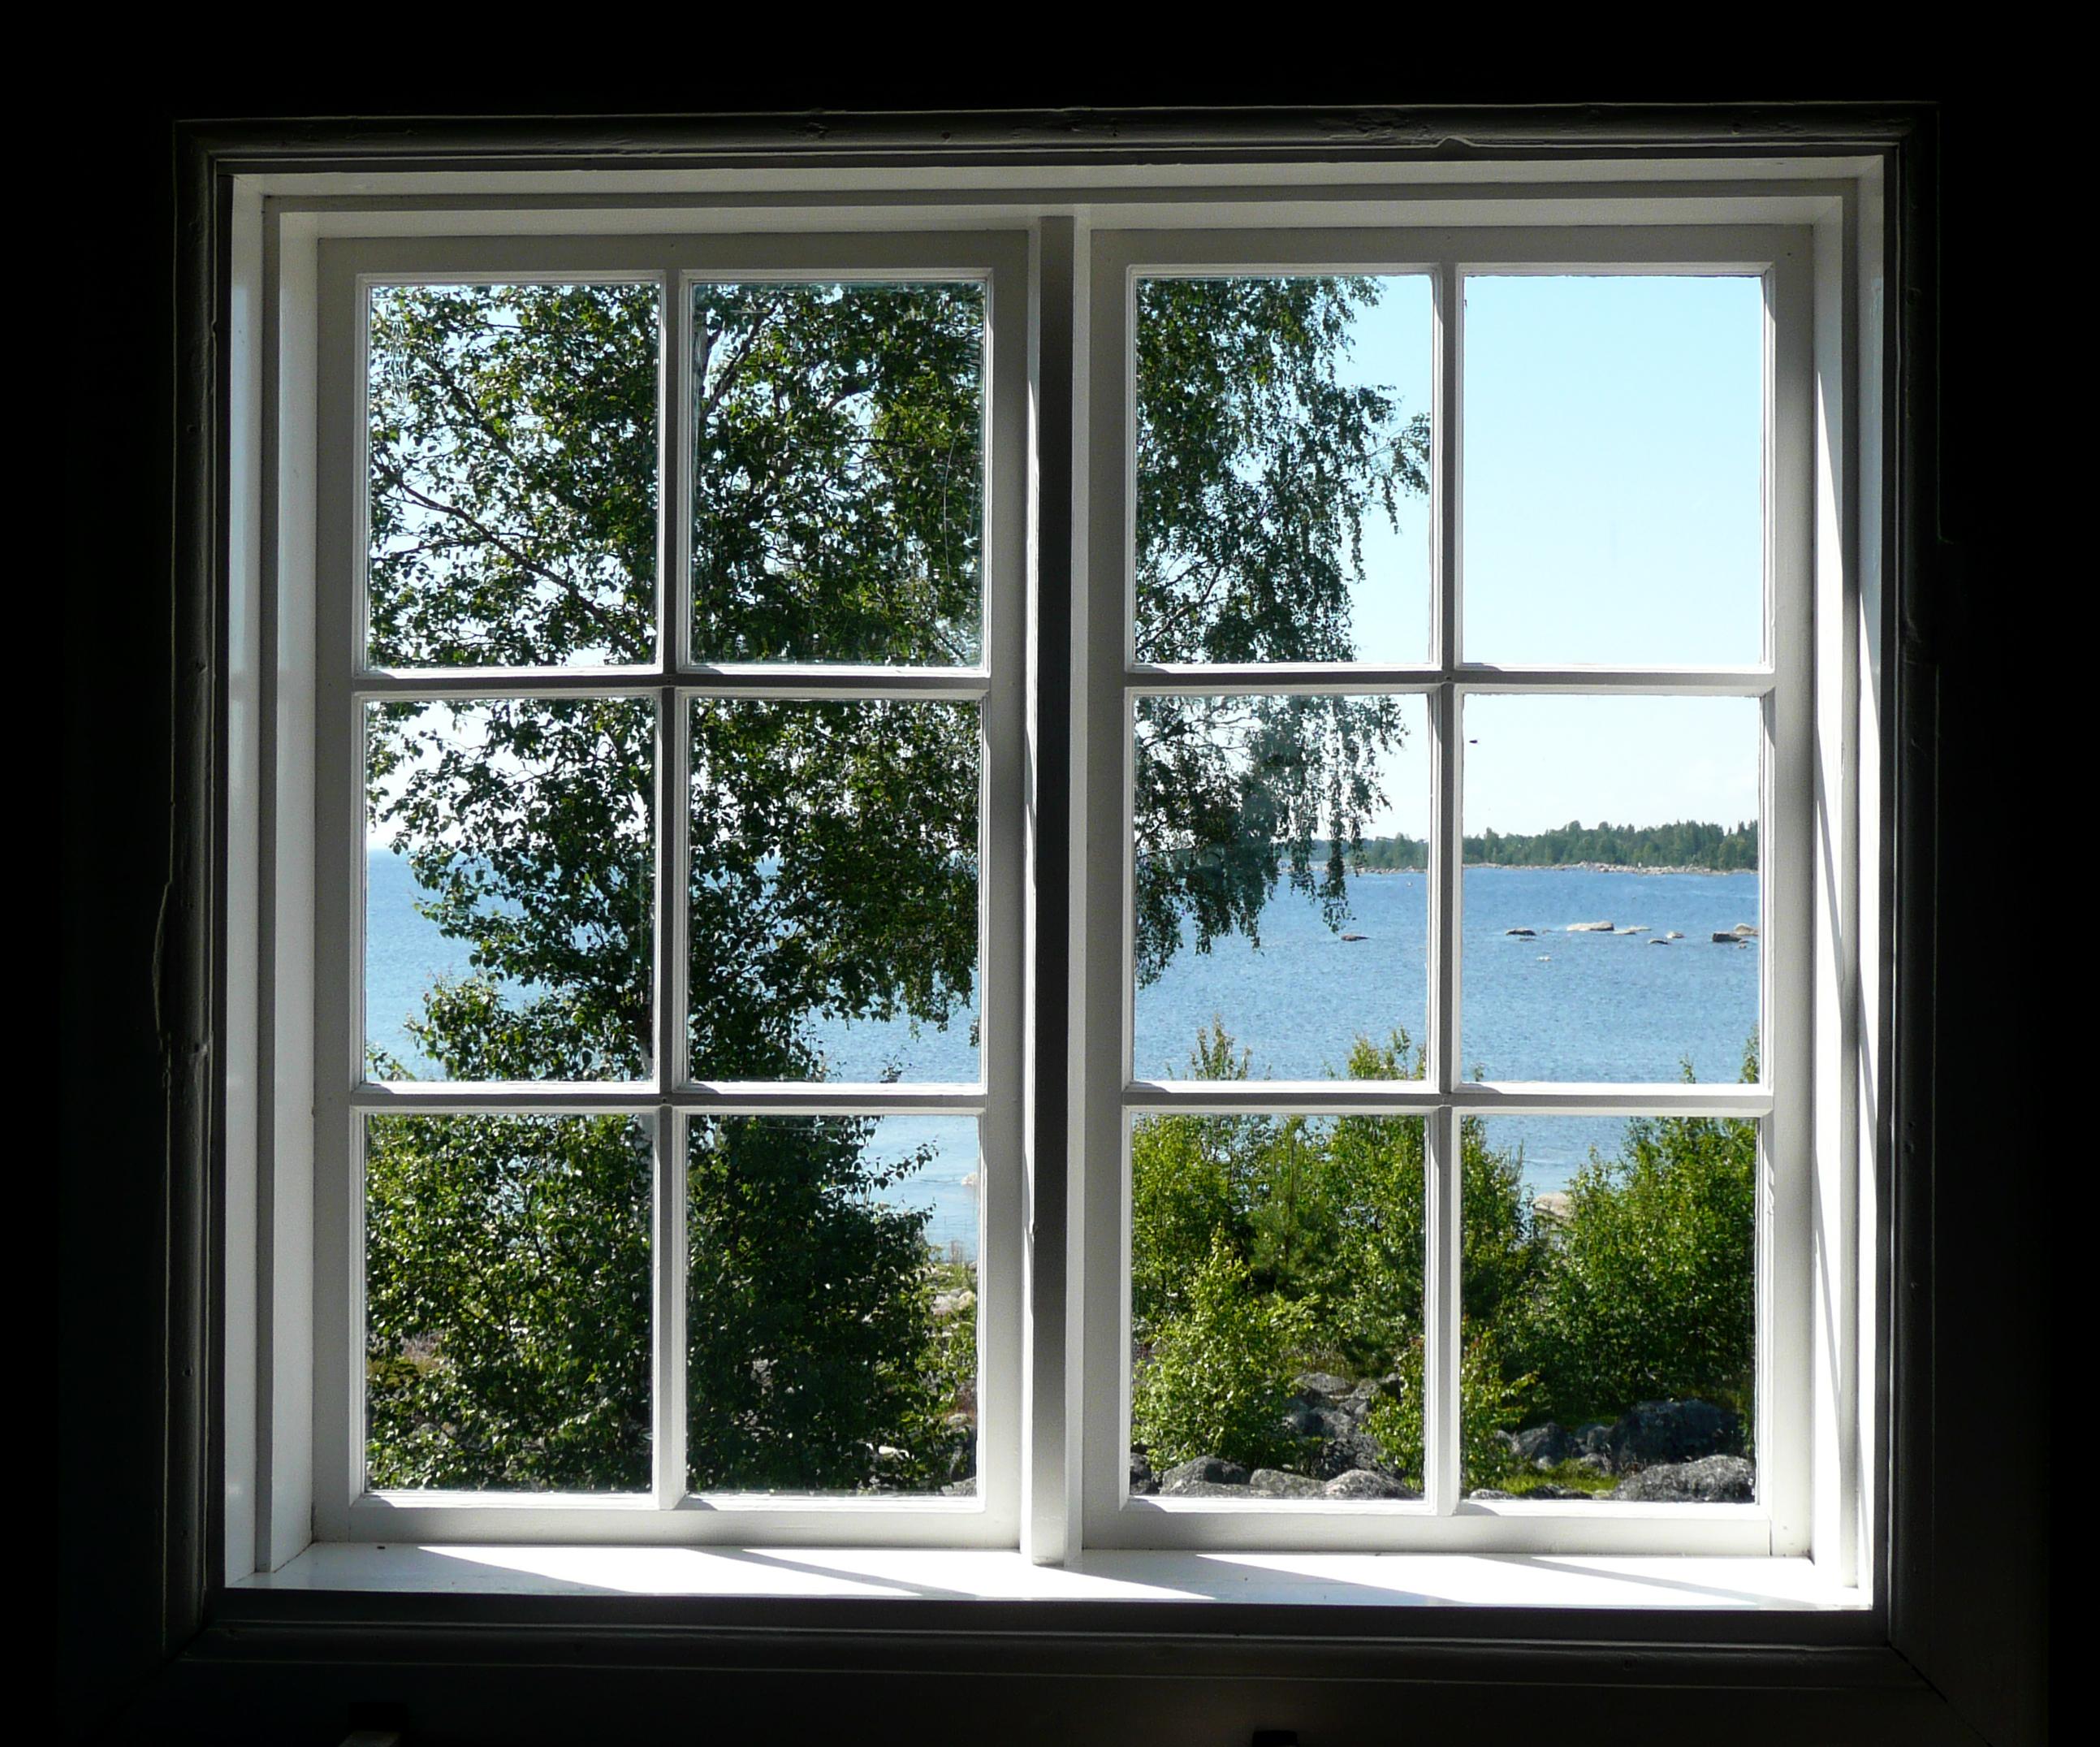 Window of house photo